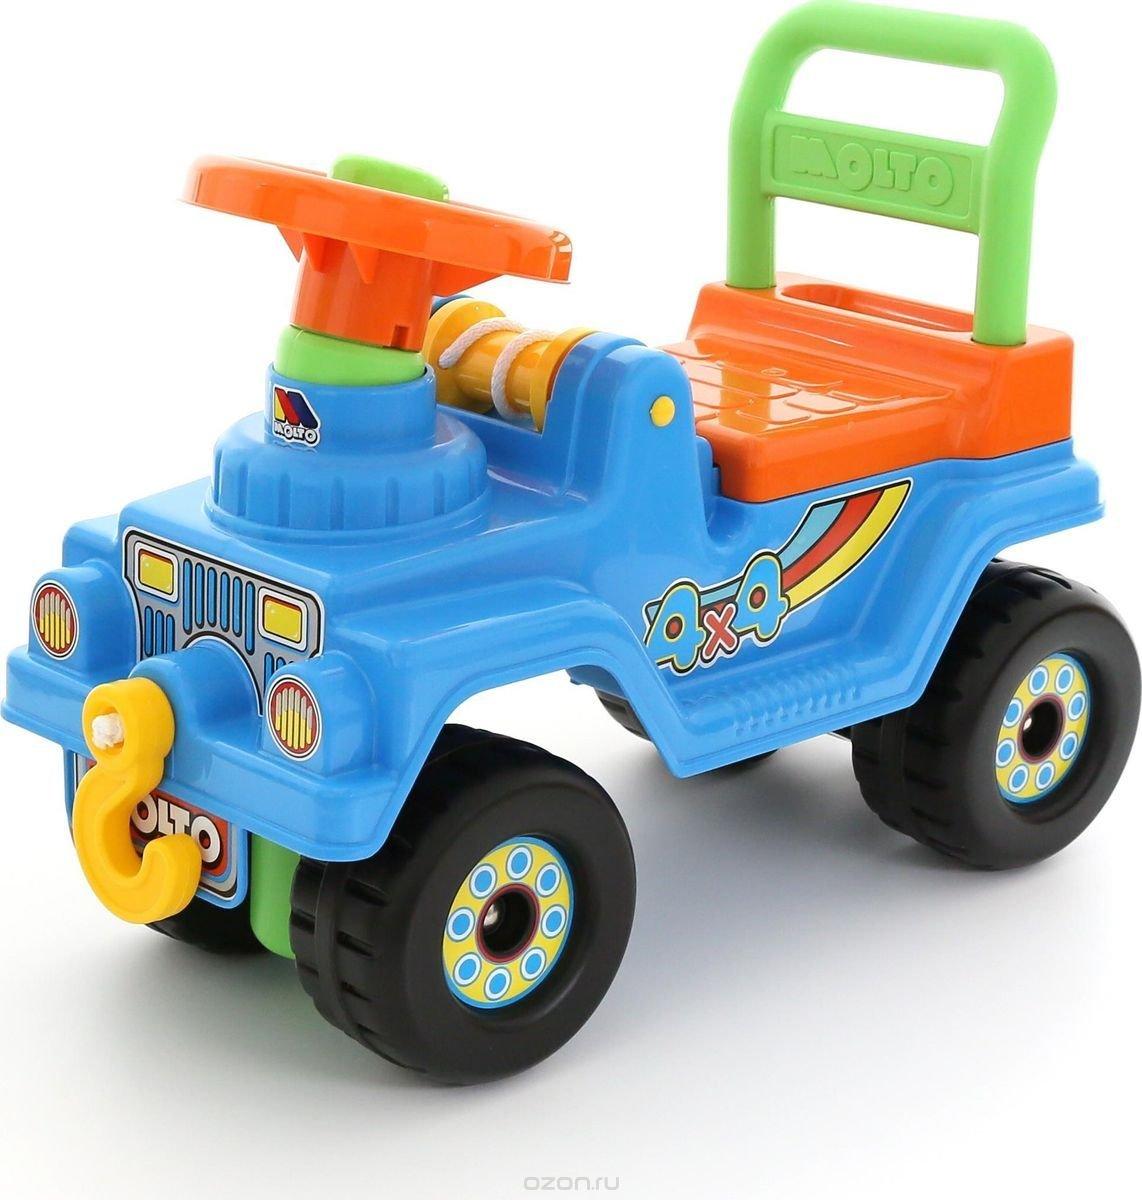 Машинки для детей фото картинки